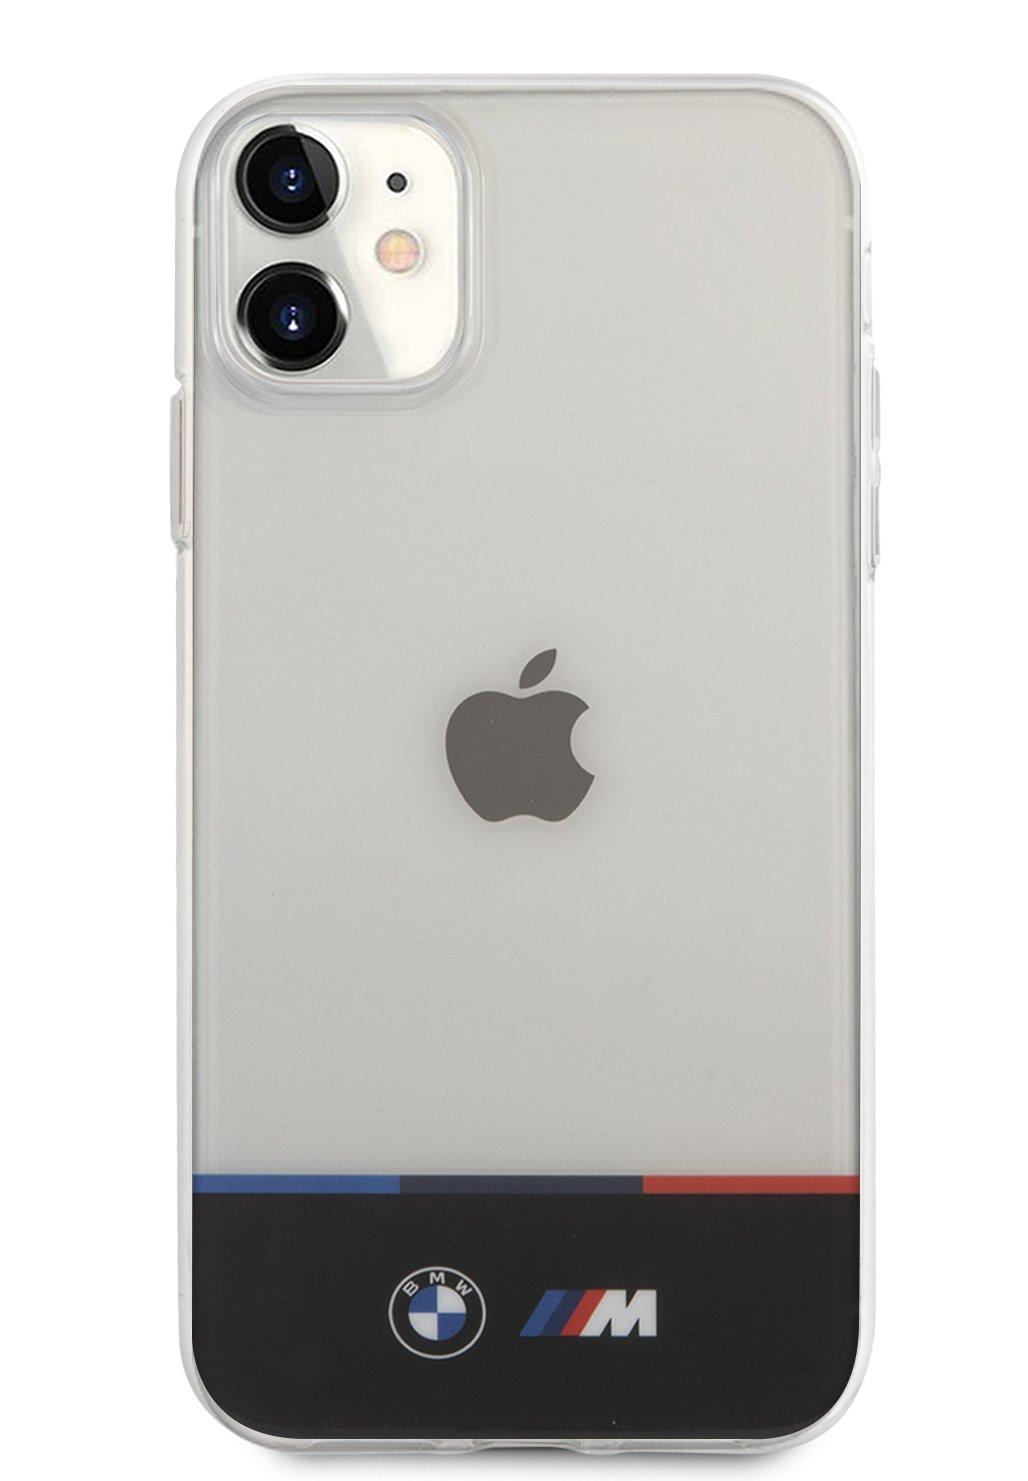 BMHCN61MHTHK BMW M PC/TPU Horizontal Tricolor Zadní Kryt pro iPhone 11 Transparent 3666339012434